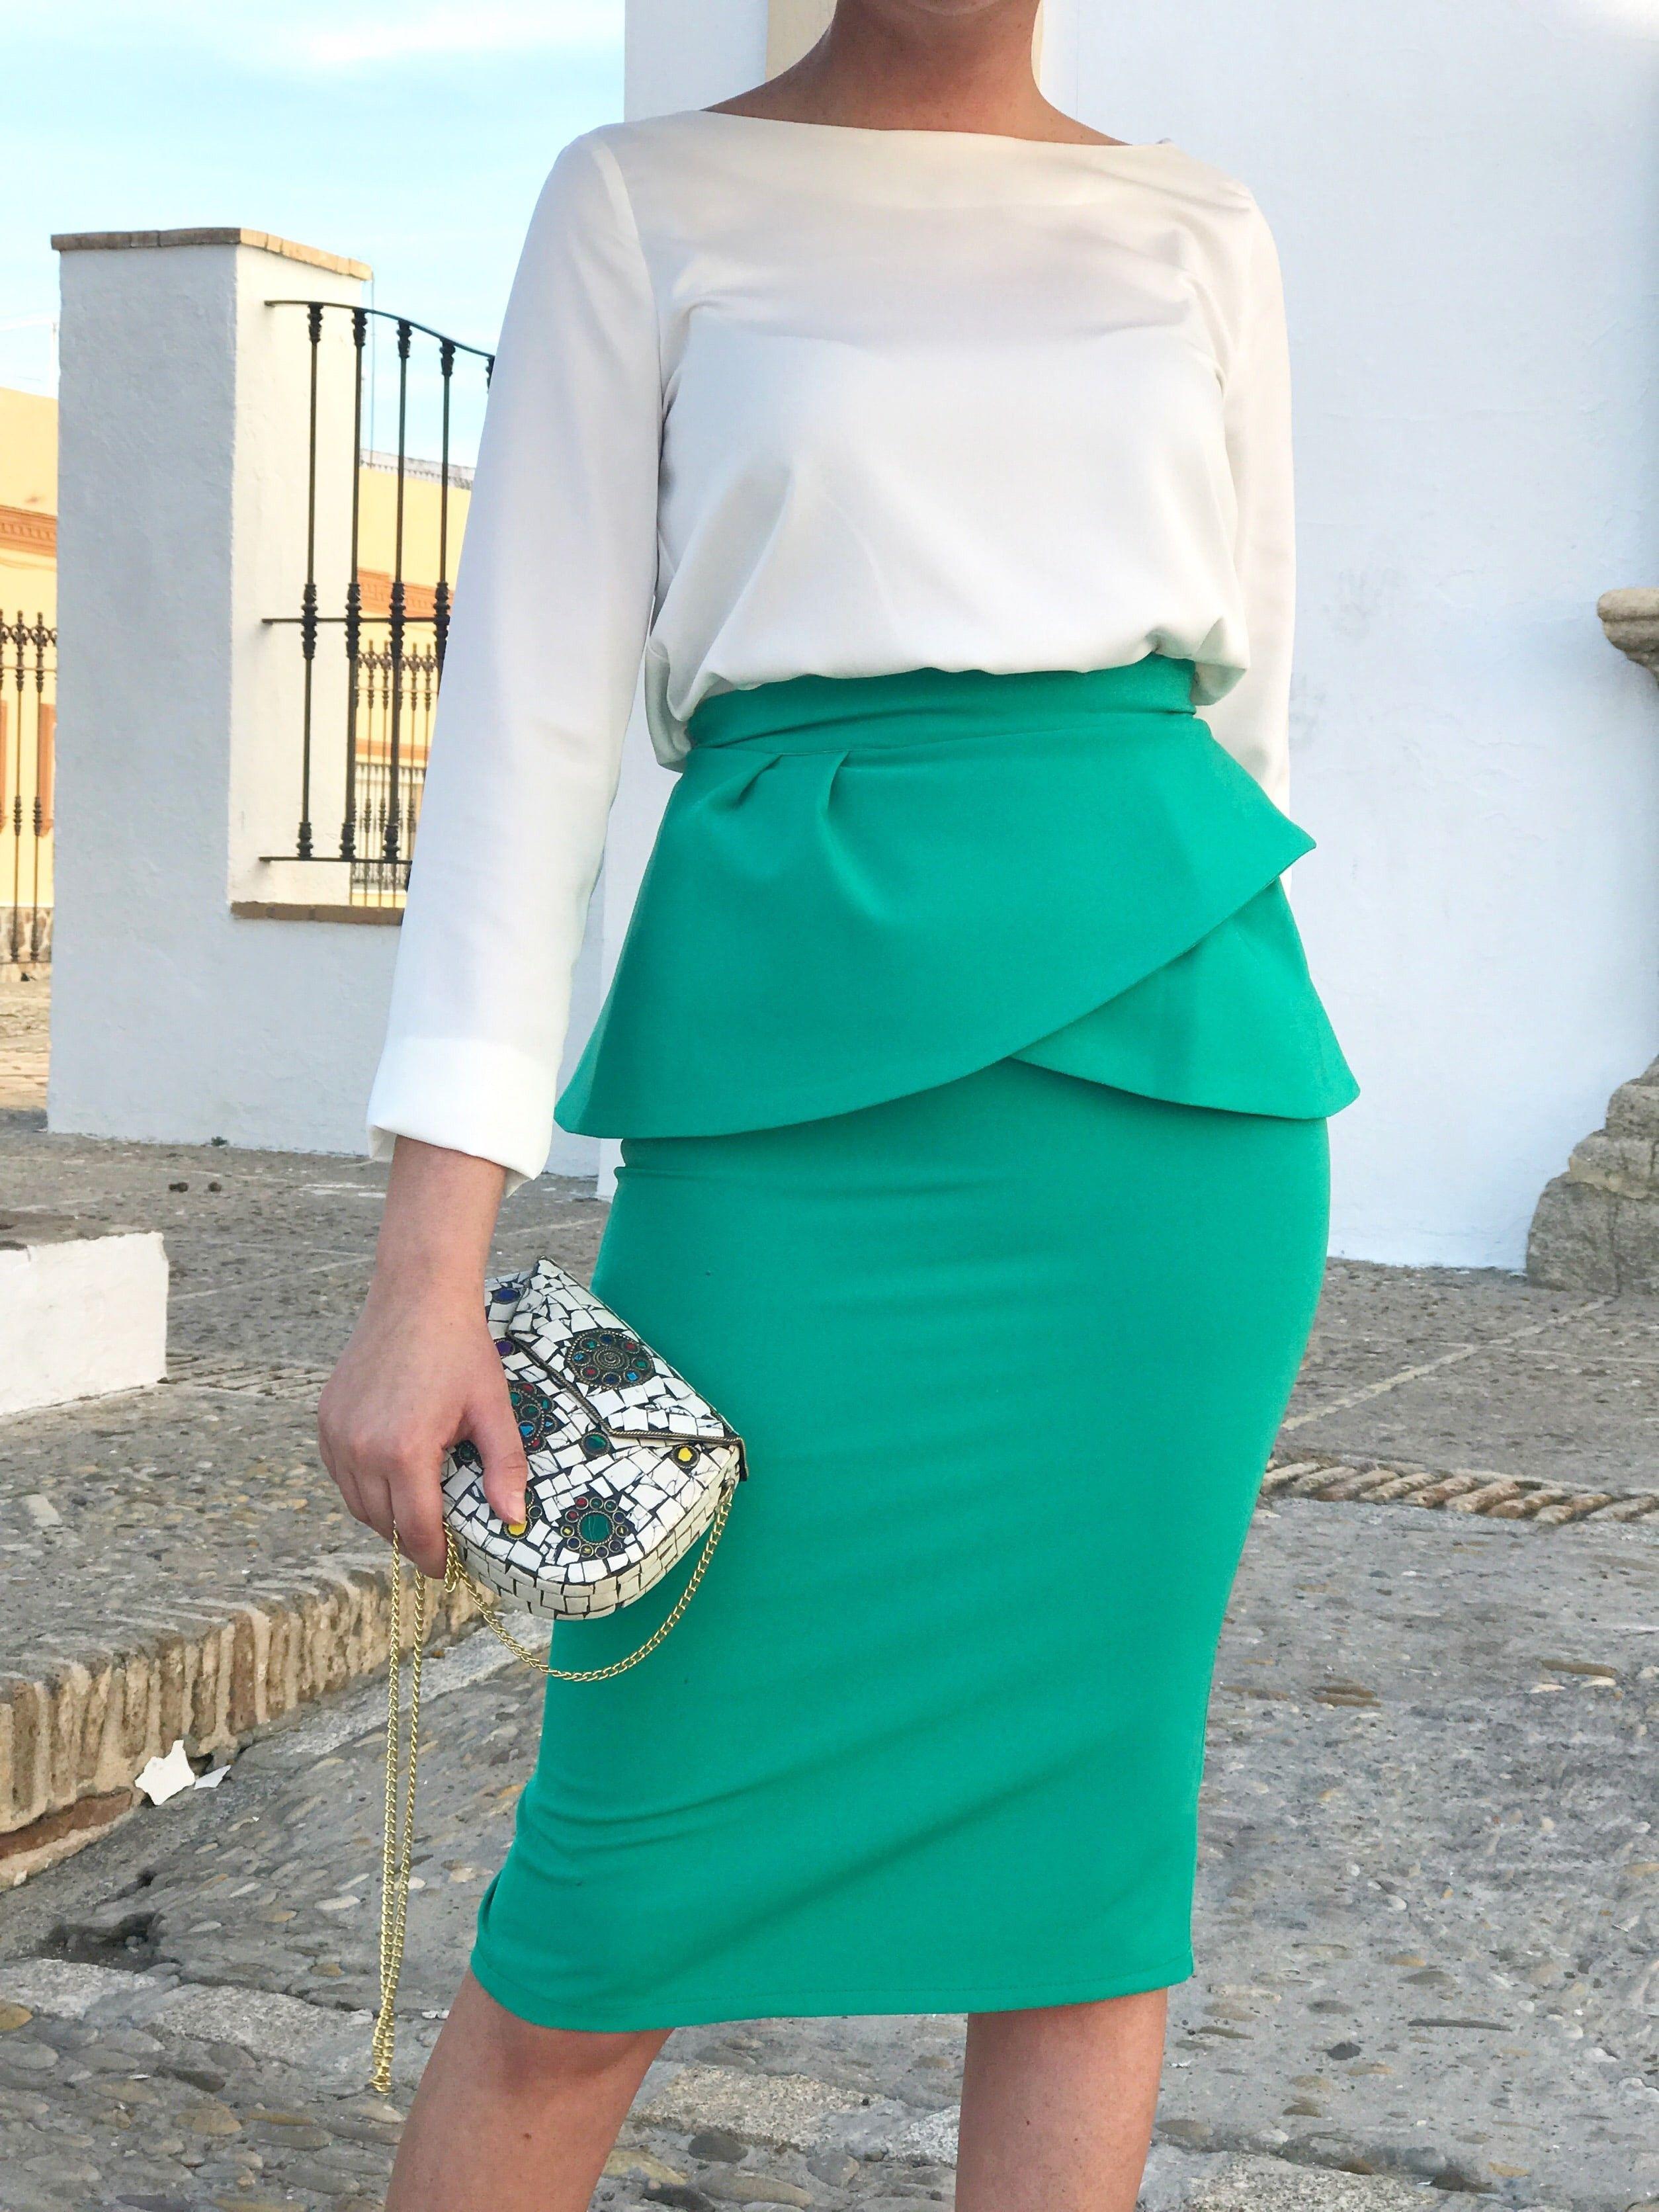 Falda Peplum By Mariquita Trasquilá. Invitada perfecta | Faldas de ...